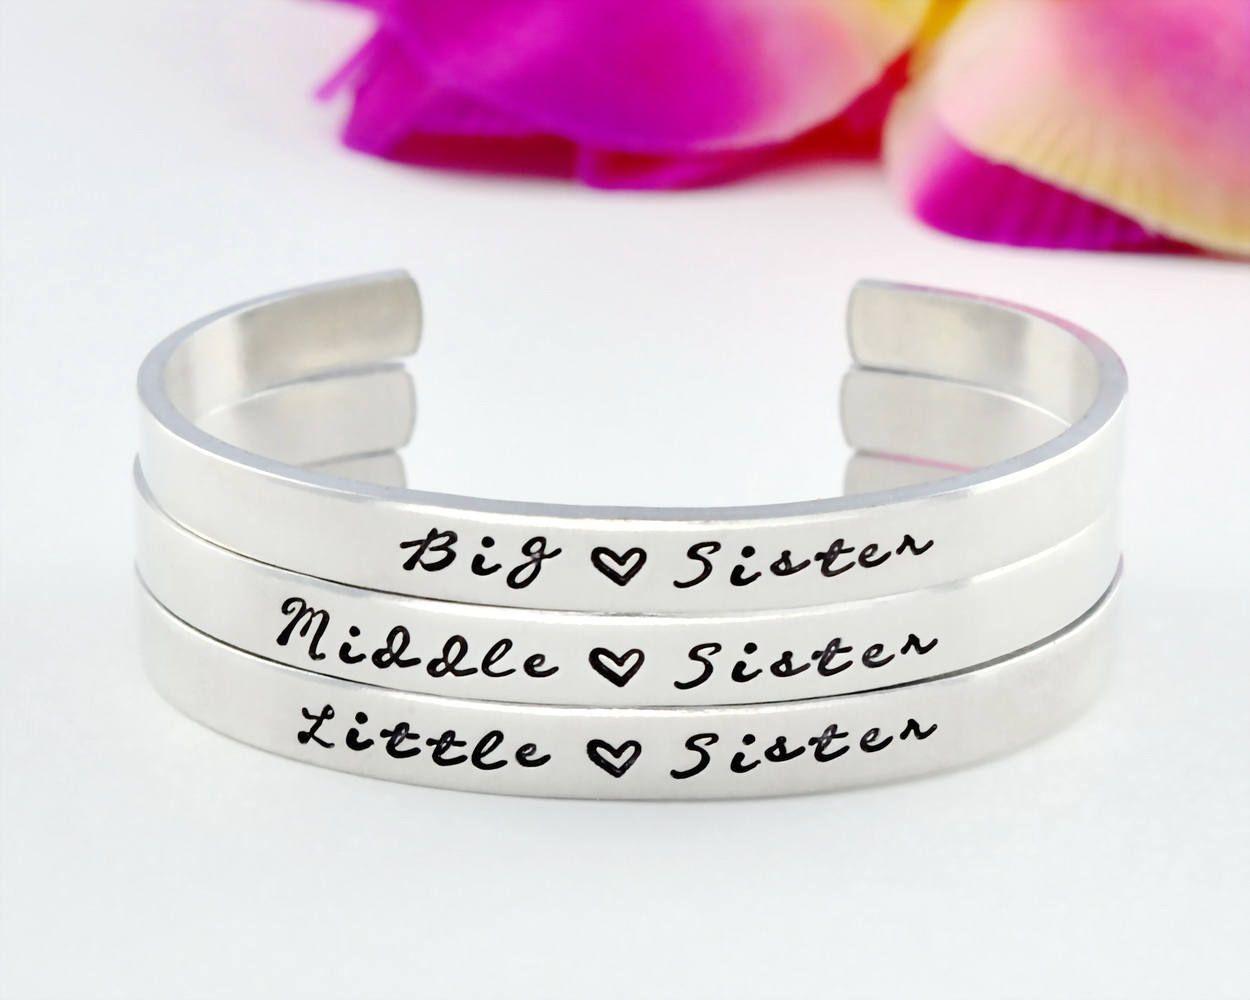 db635ac6ce0 Big Sister Middle Sister Little Sister Cuff Bracelet Set, Three Sisters  Bracelets, Sister Matching Cuff Bangles, Big Mid Lil Sis Gift, V1